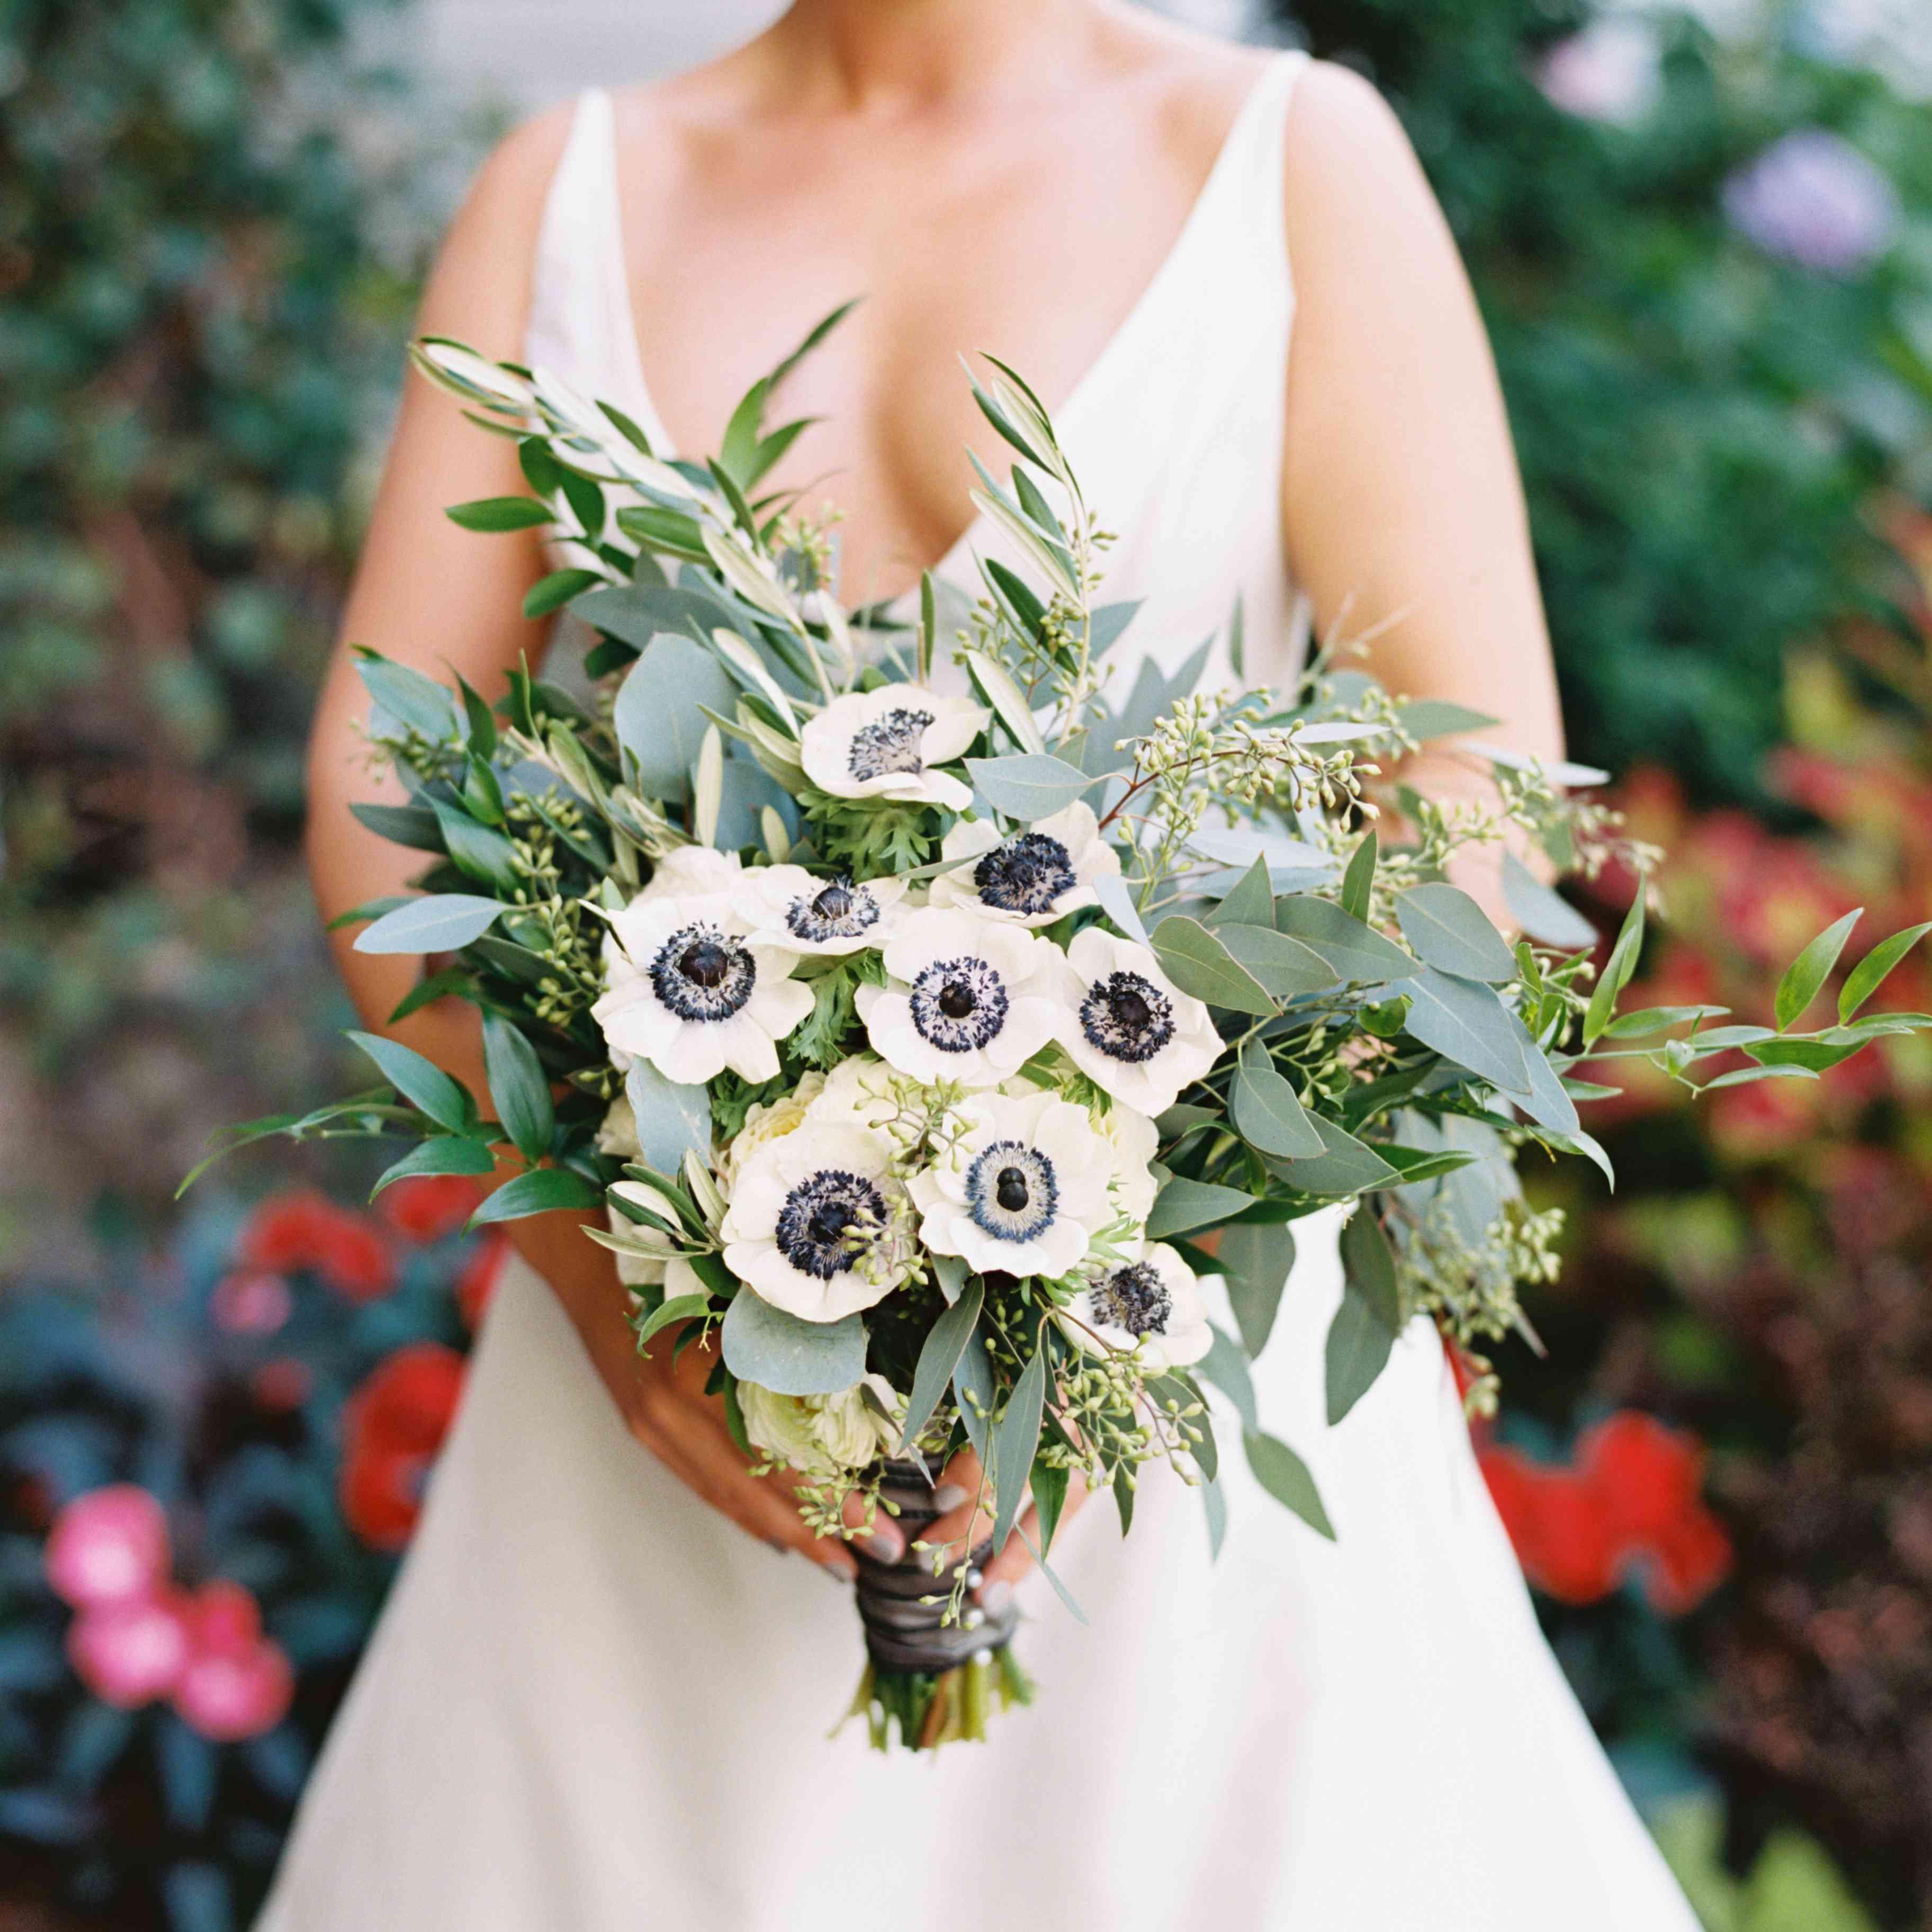 Bride's bouquet featuring white panda anemones